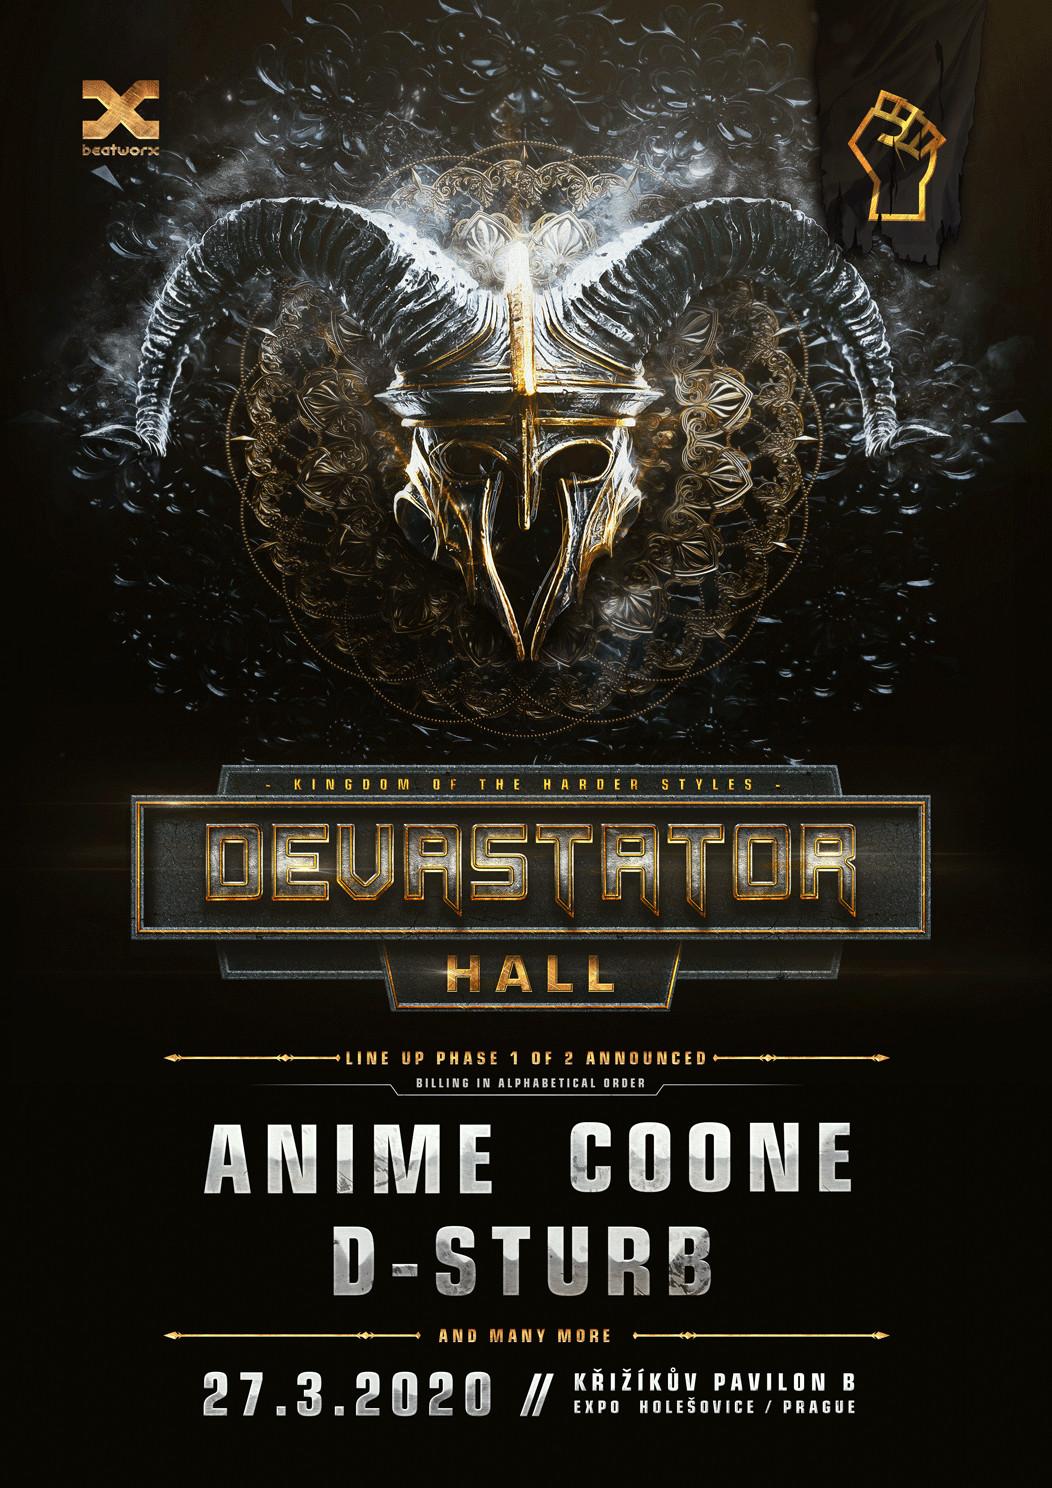 Devastator Hall